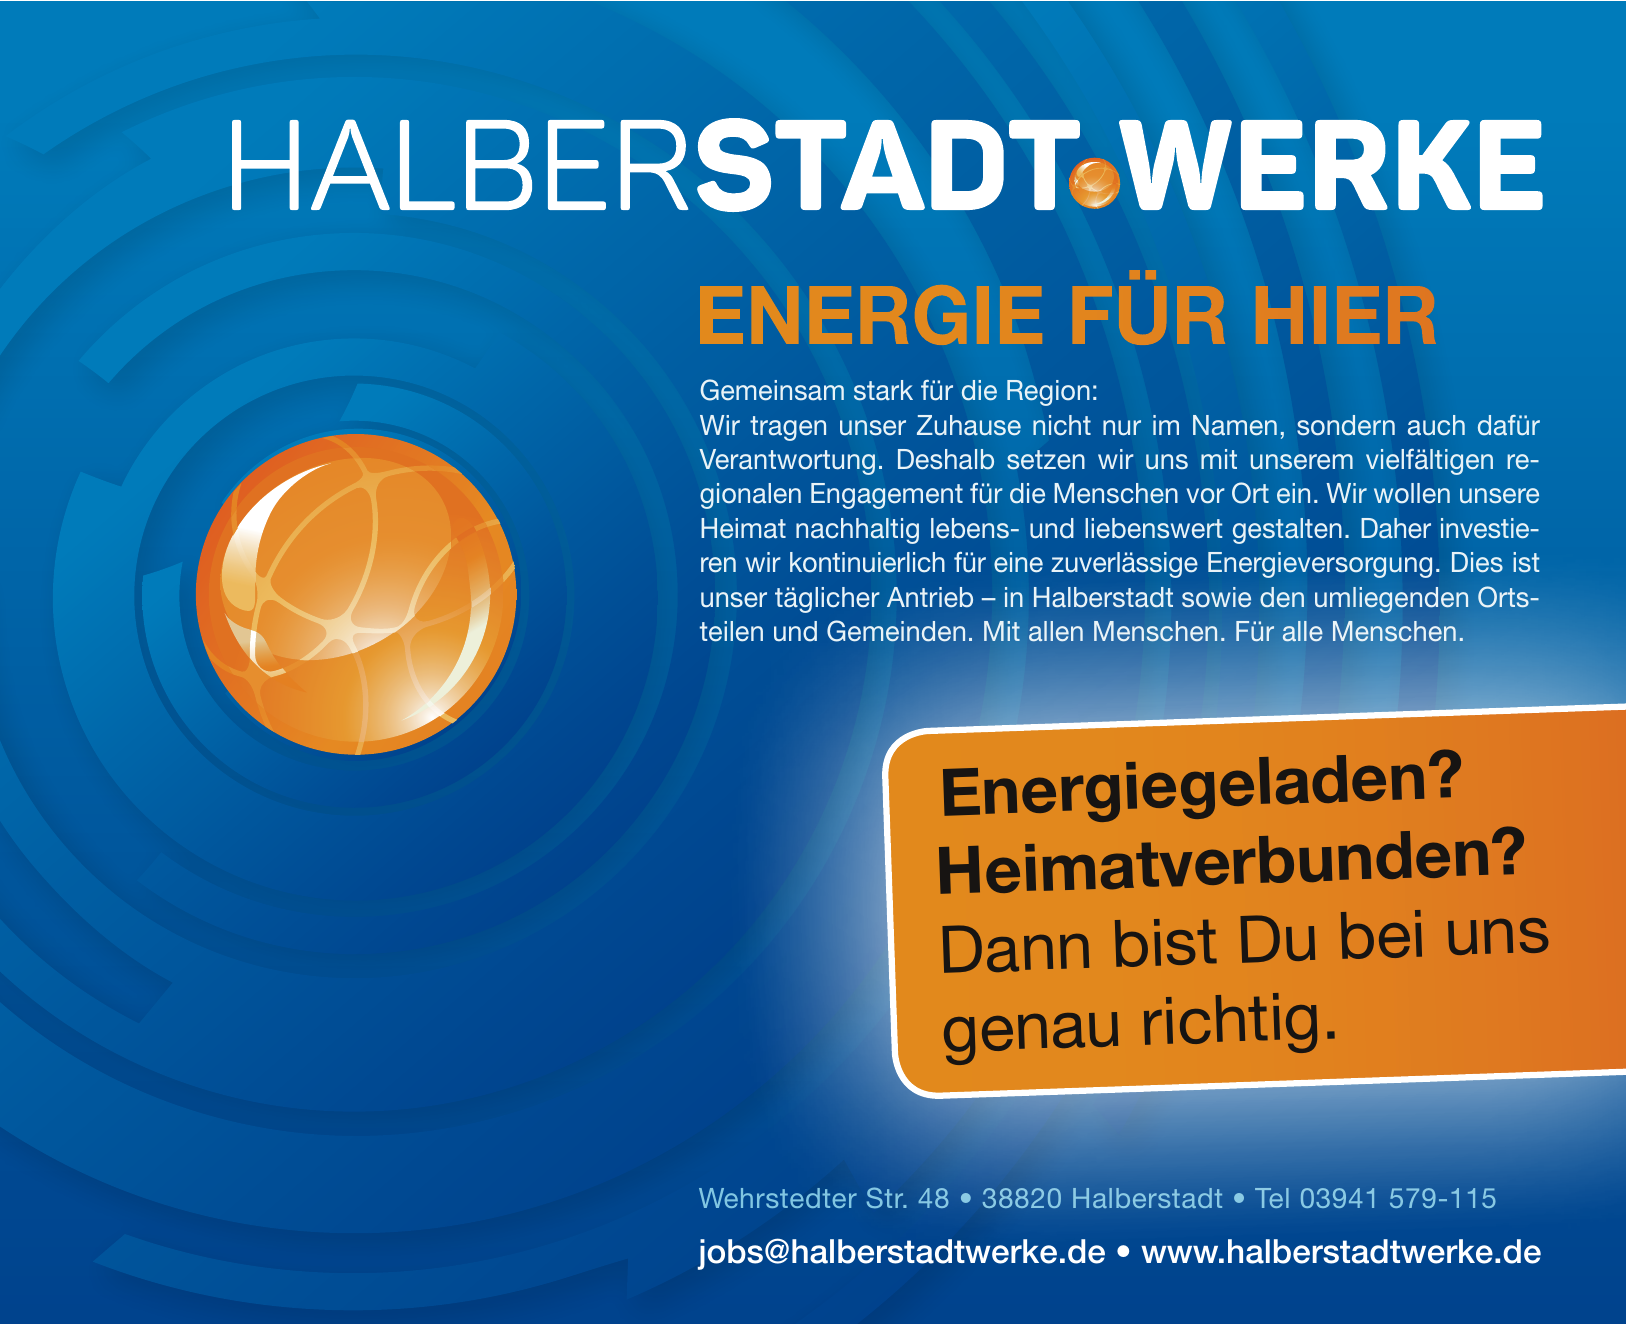 Halberstadtwerke GmbH